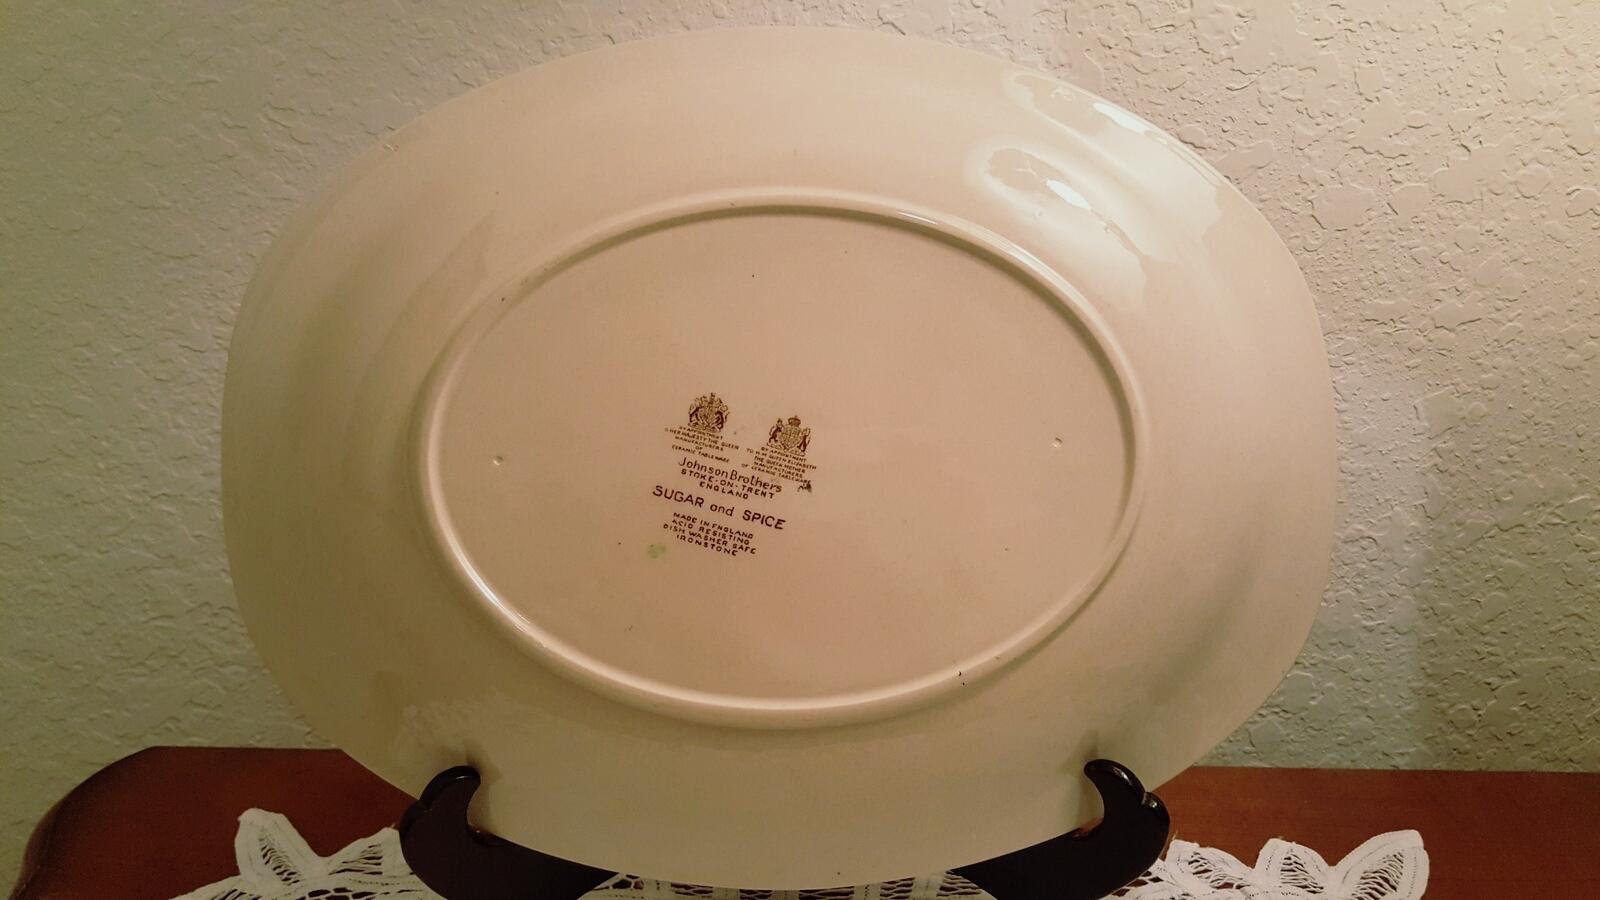 Vintage Johnson Brothers Ceramic Sugar and Spice Brown Oval Serving Platter